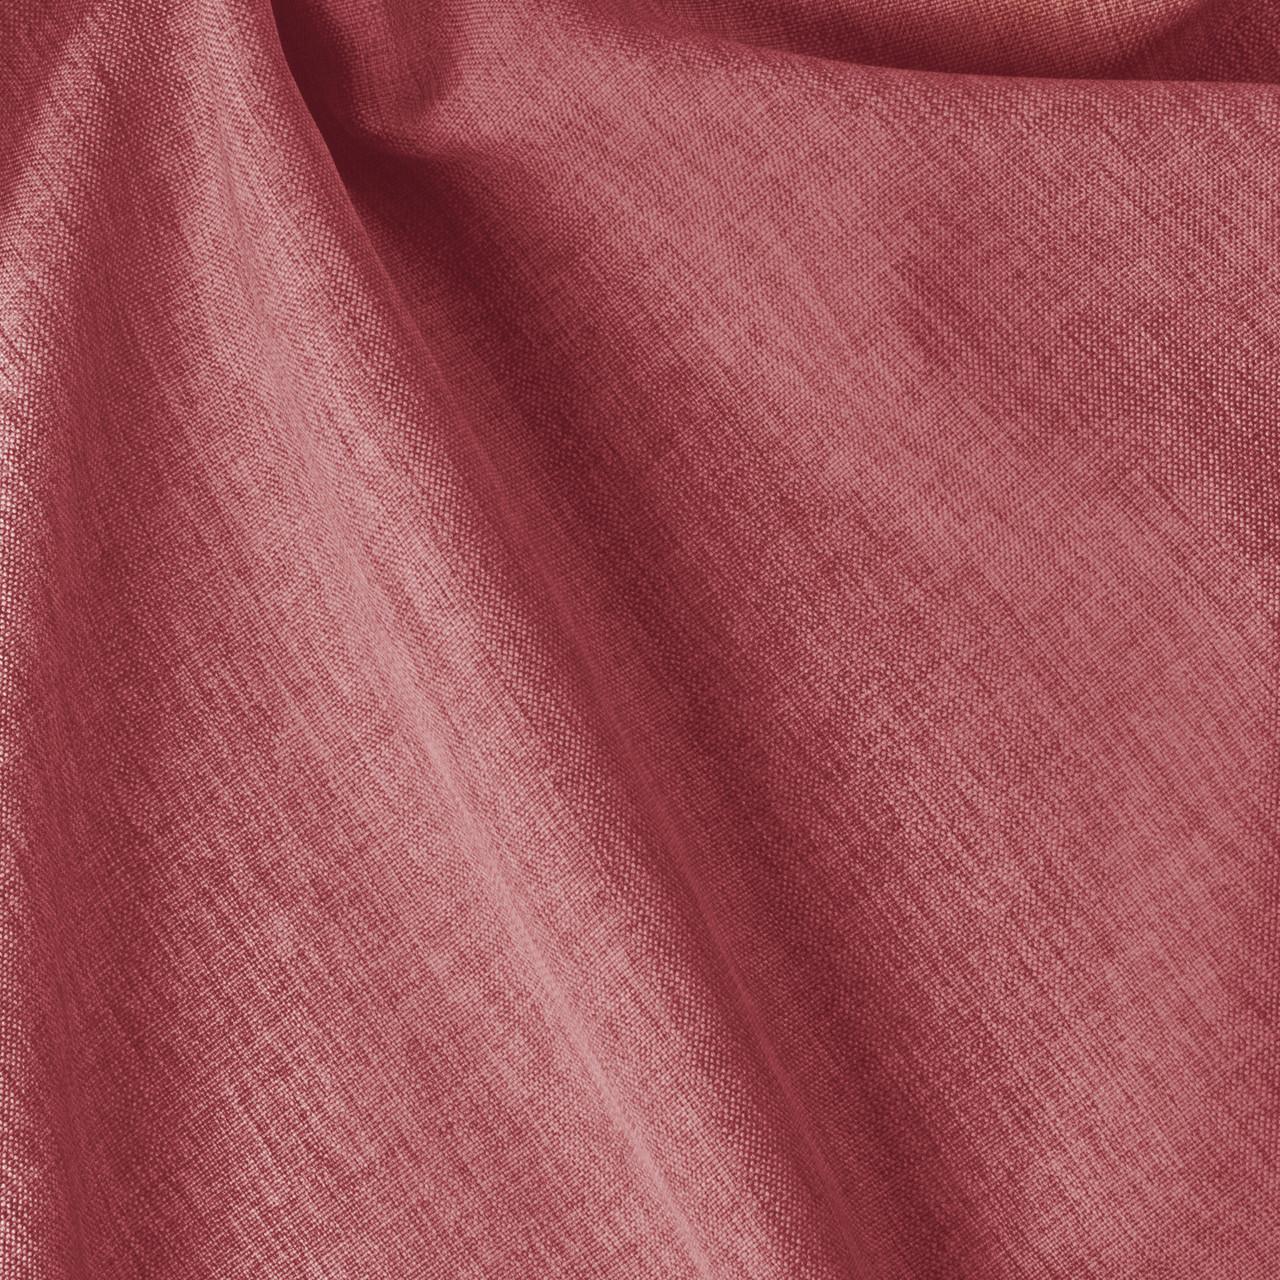 Декоративная однотонная рогожка розового цвета 300см 84458v15